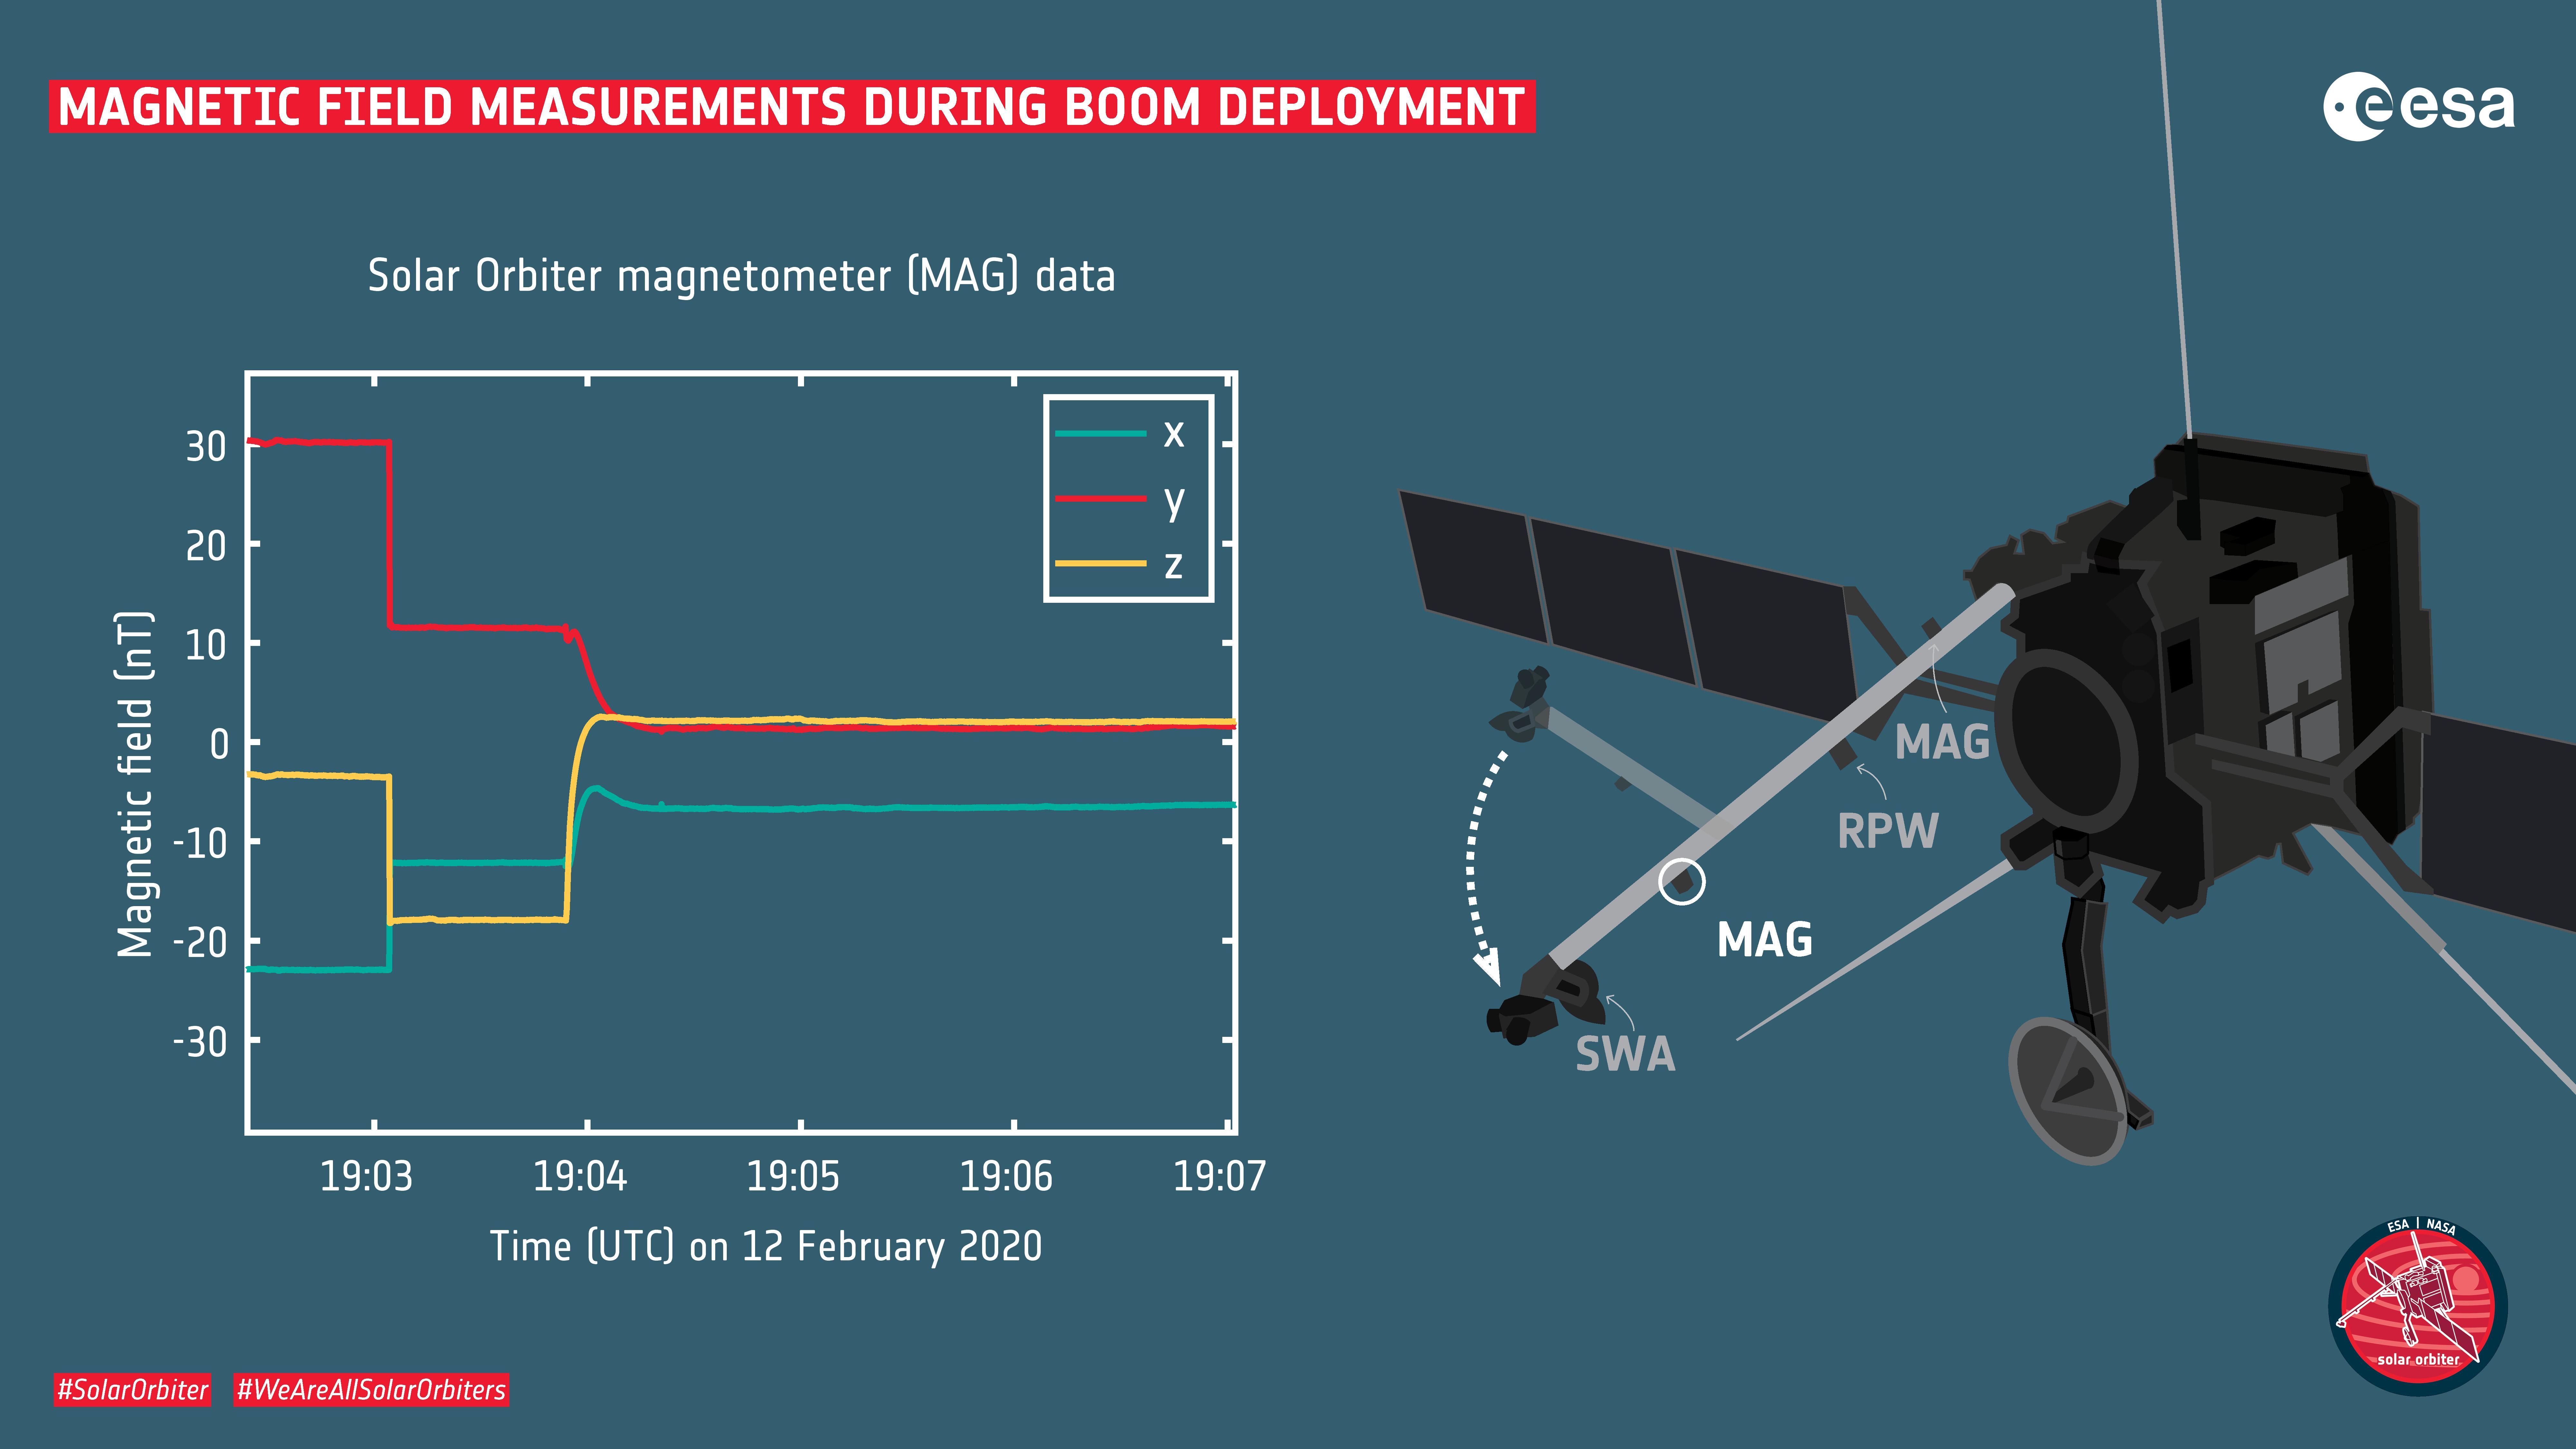 Solar_Orbiter_magnetic_field_measurements_during_boom_deployment.jpg